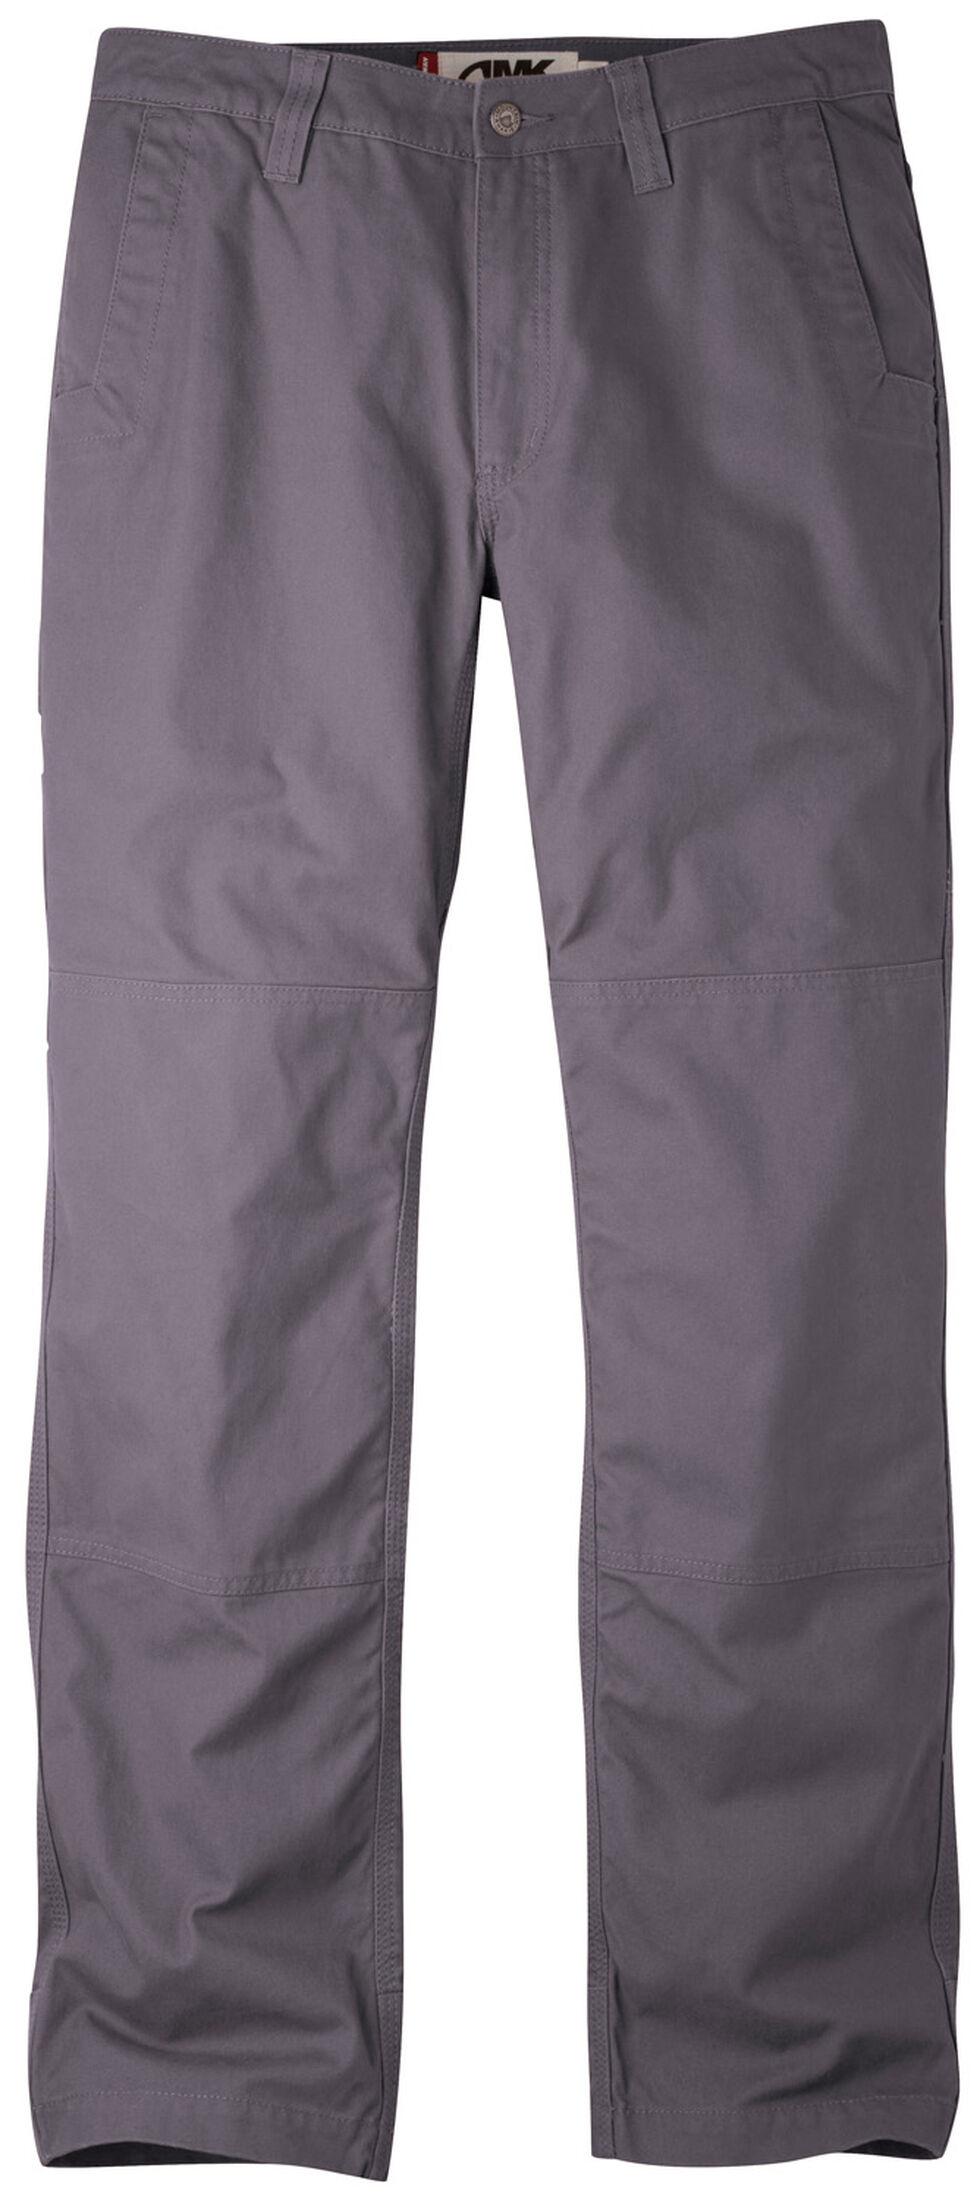 Mountain Khakis Men's Granite Alpine Utility Pants - Relaxed Fit , Grey, hi-res